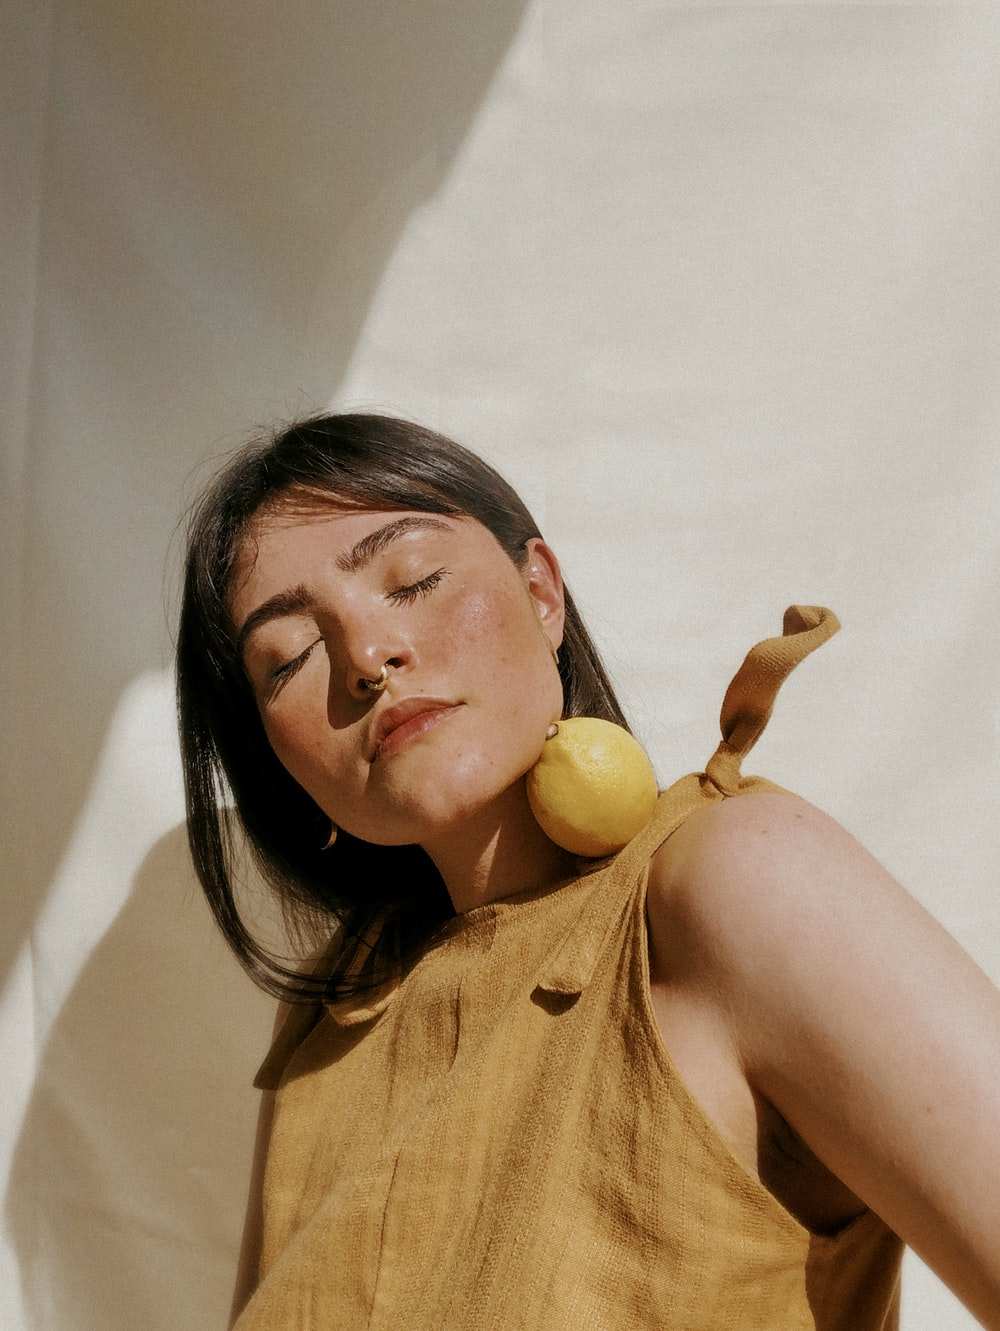 woman in yellow sleeveless dress holding yellow fruit